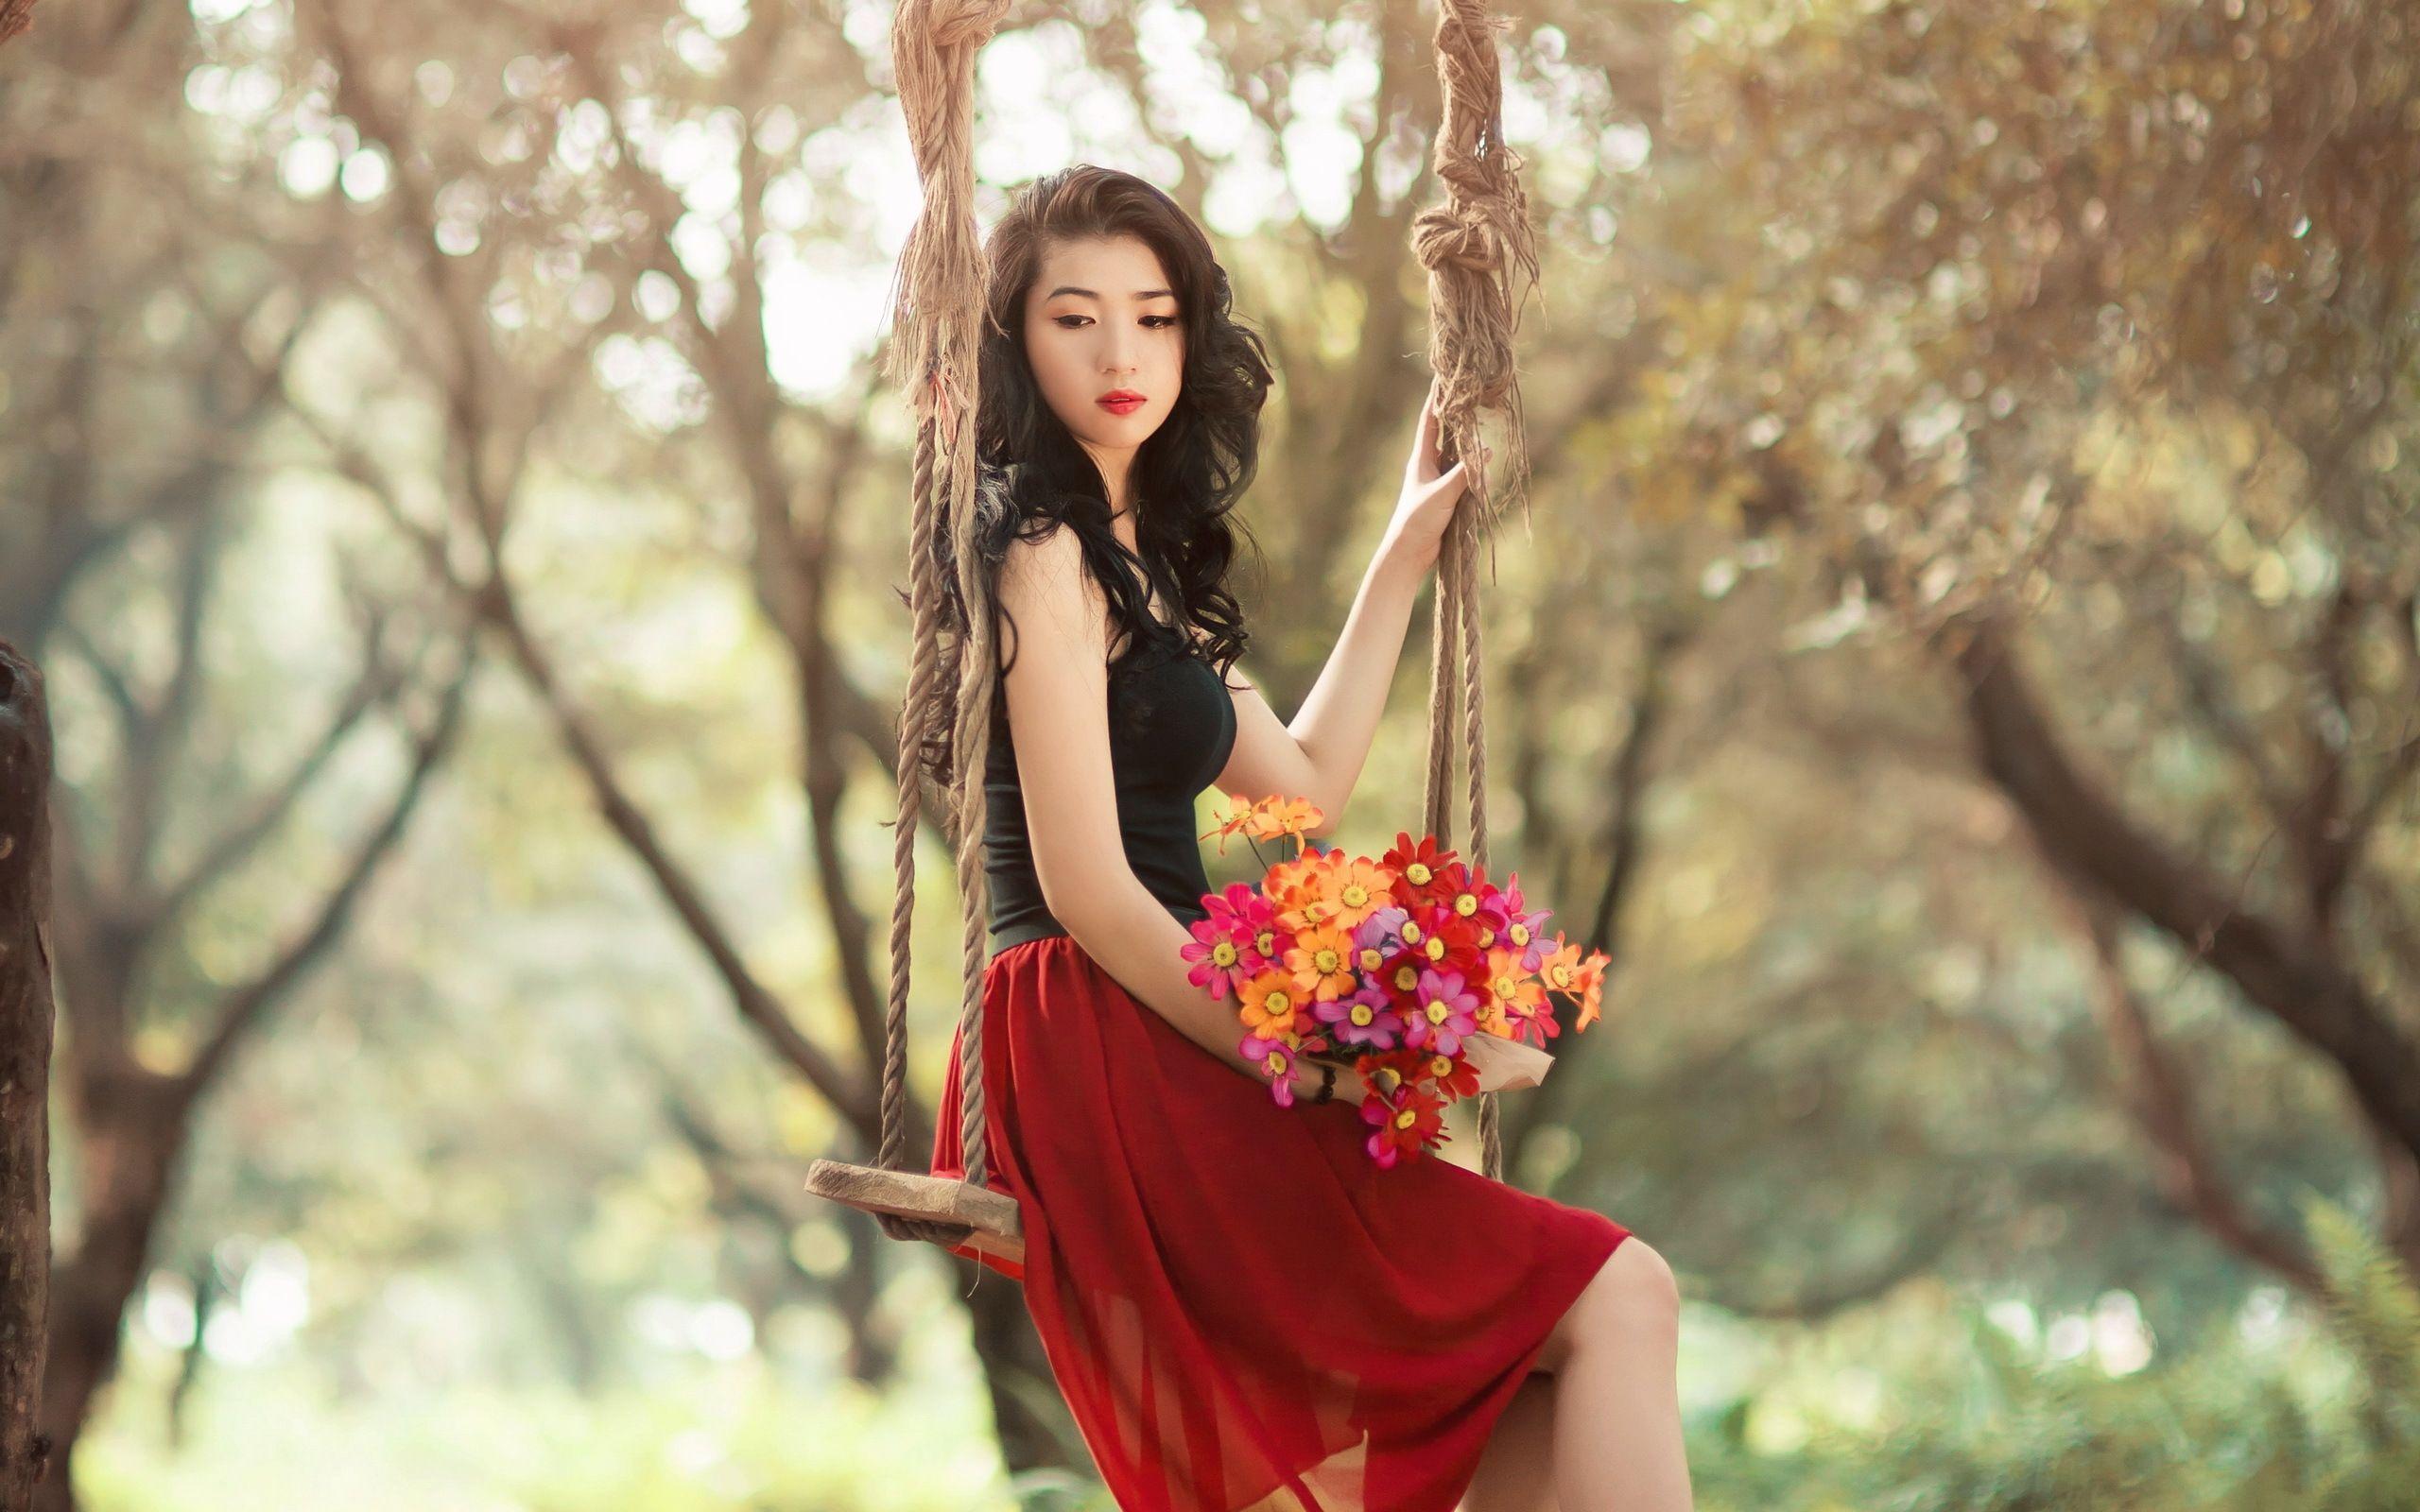 Natural Beauty Girl Beautygirl Naturalbeautygirl Beautifulgirl Beautiful Girl Wallpaper Girls With Flowers Beautiful Girl Image